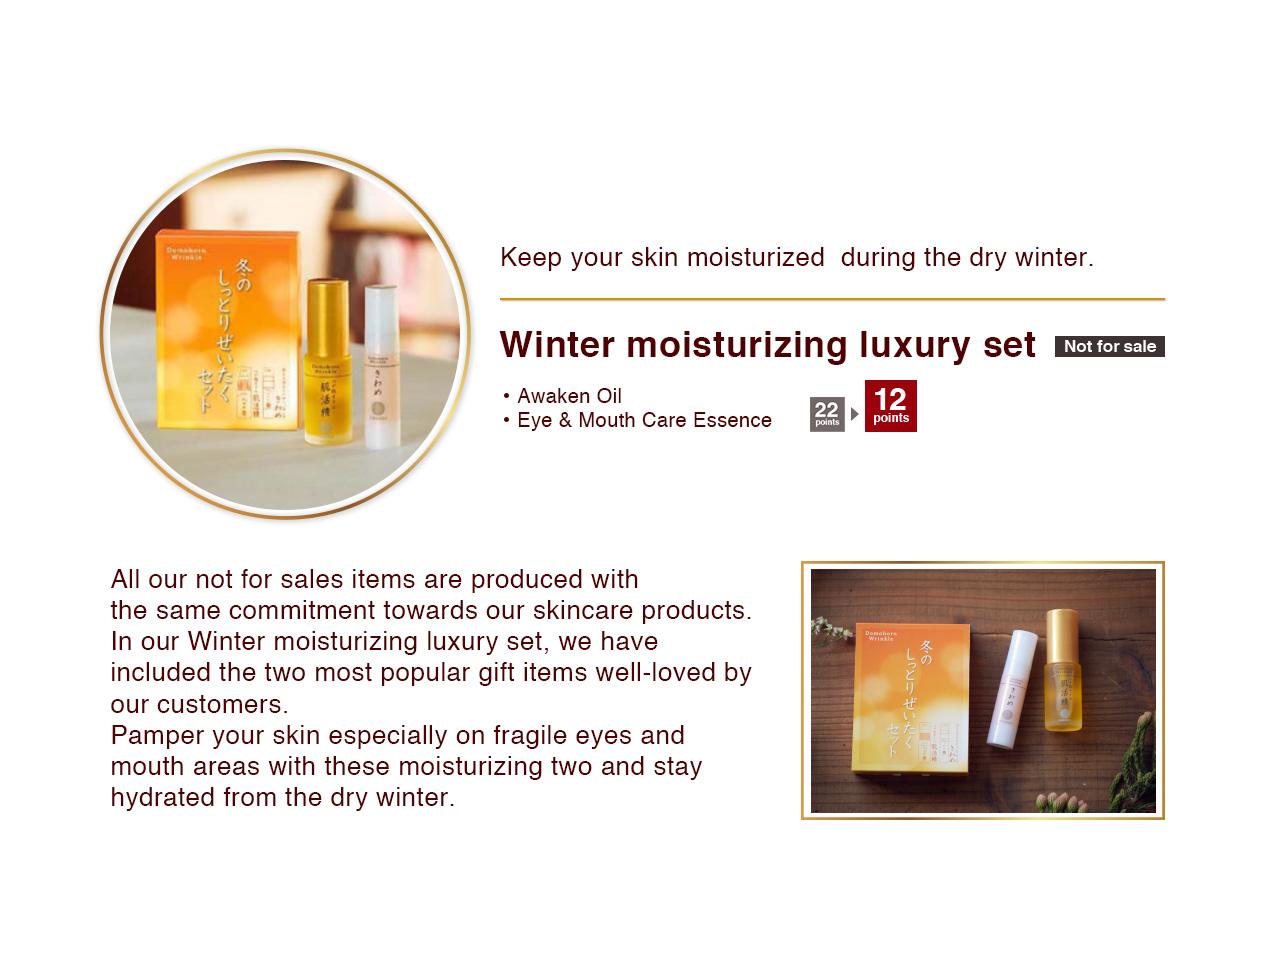 Winter moisturizing luxury set